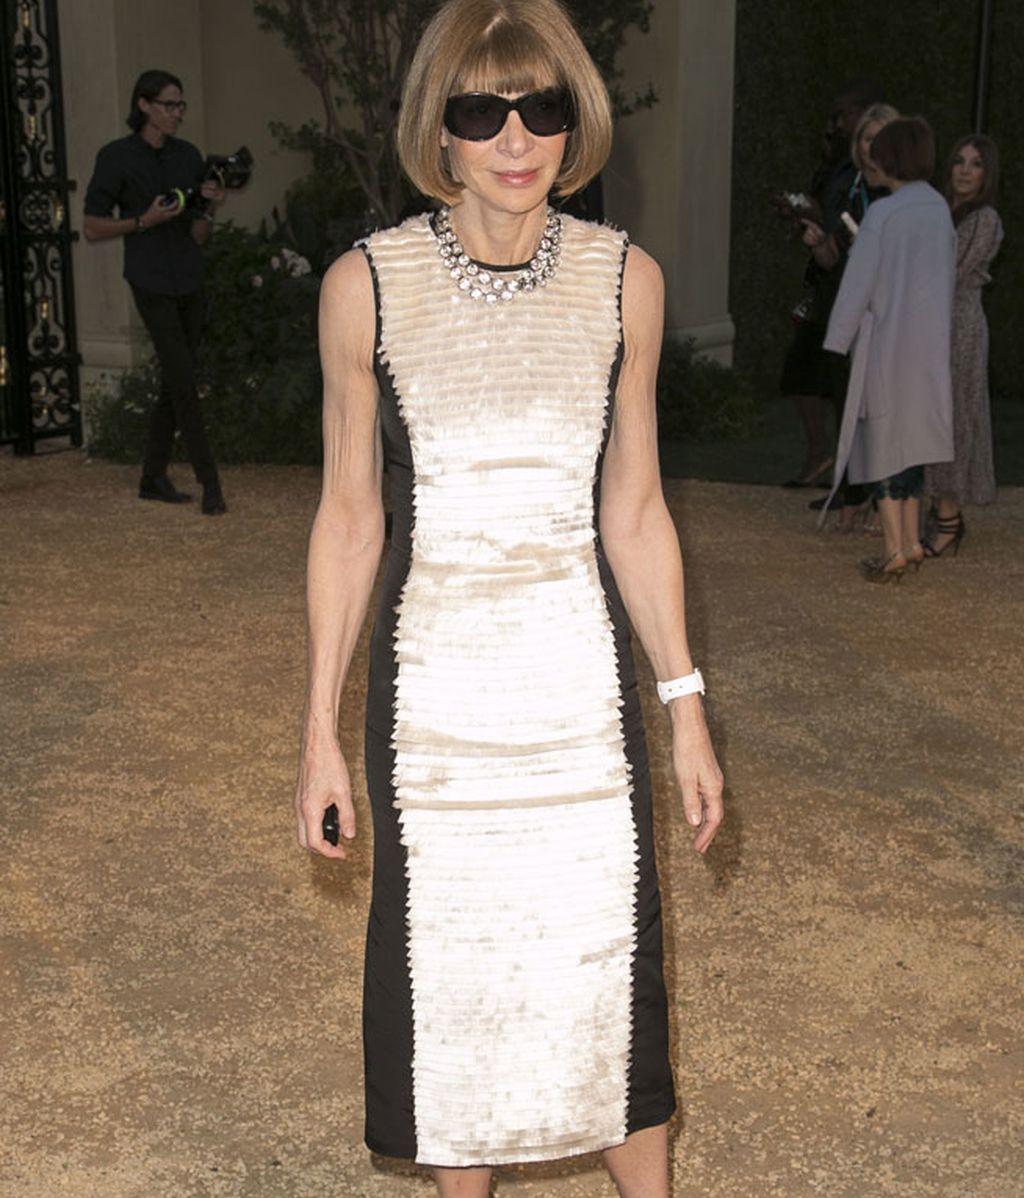 Ana Wintour con sus acostumbradas gafas de sol